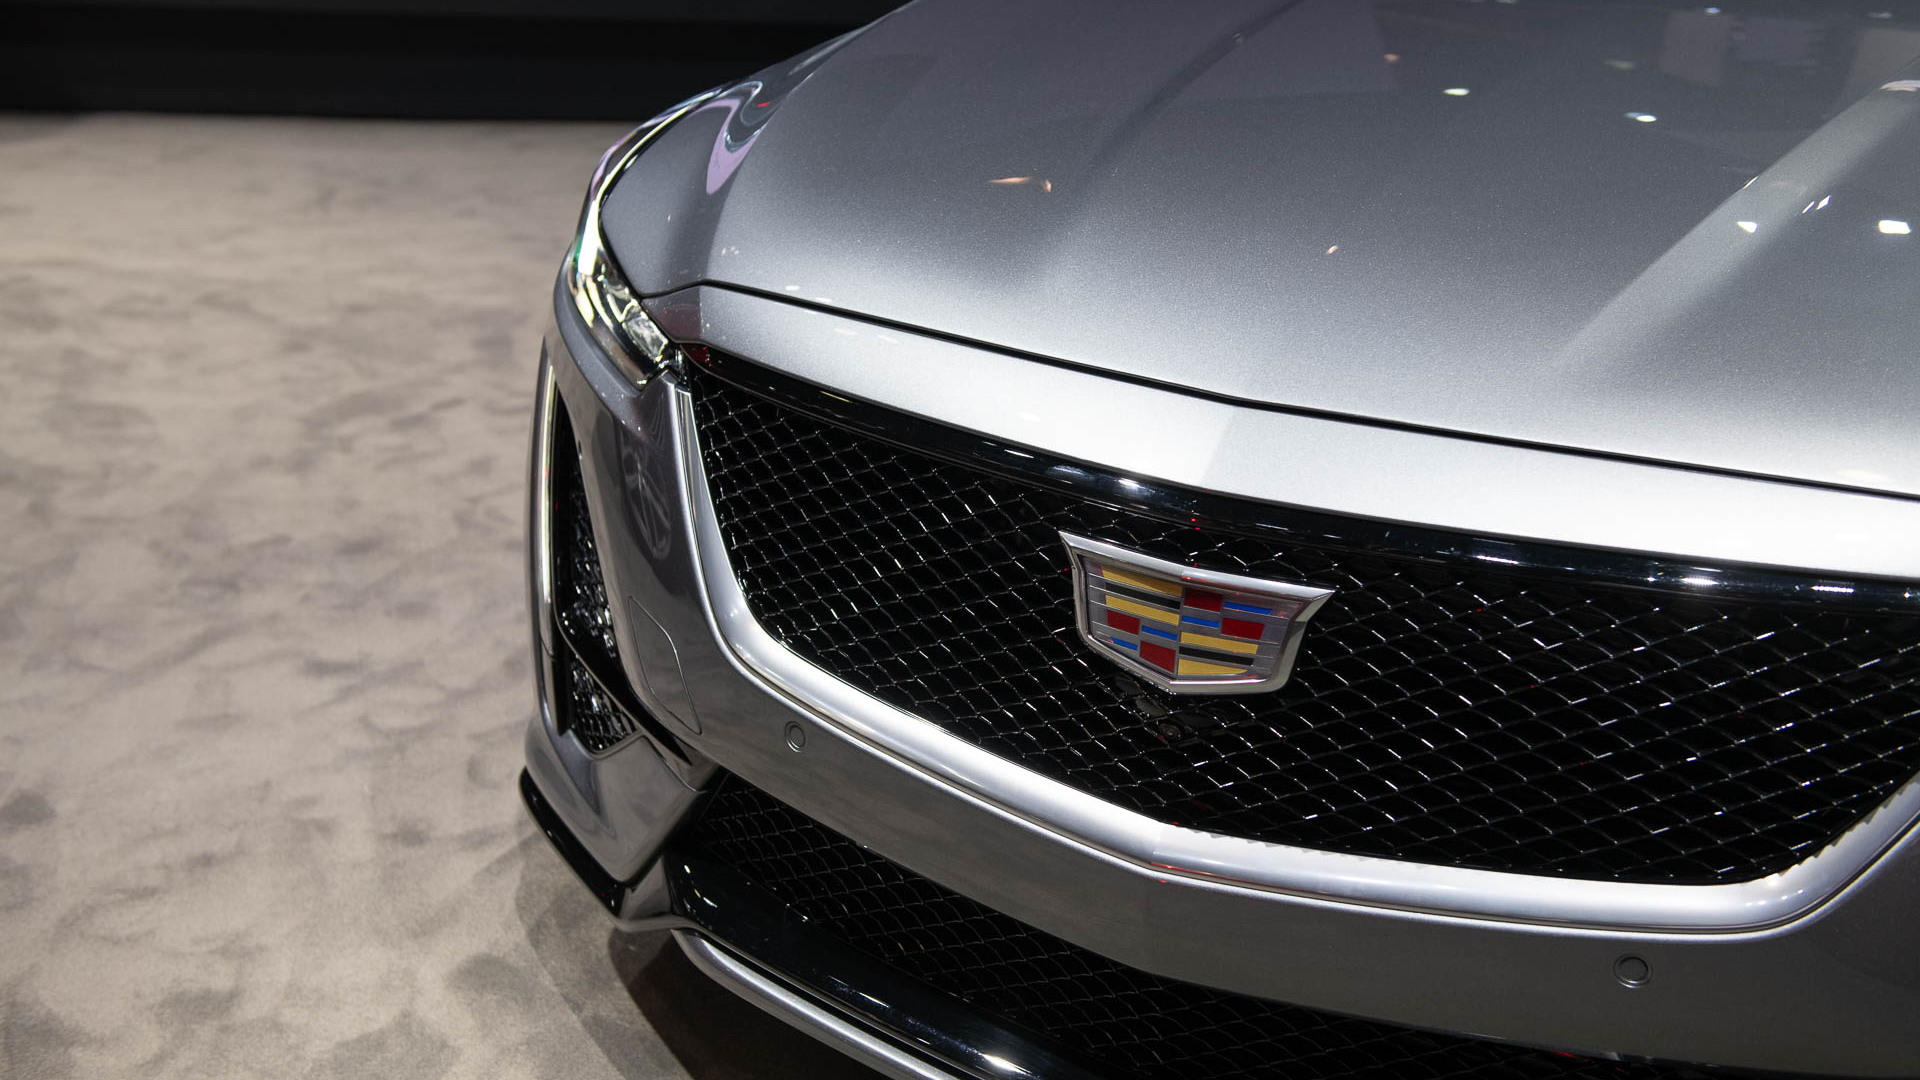 2020 Cadillac CT5, 2019 New York International Auto Show